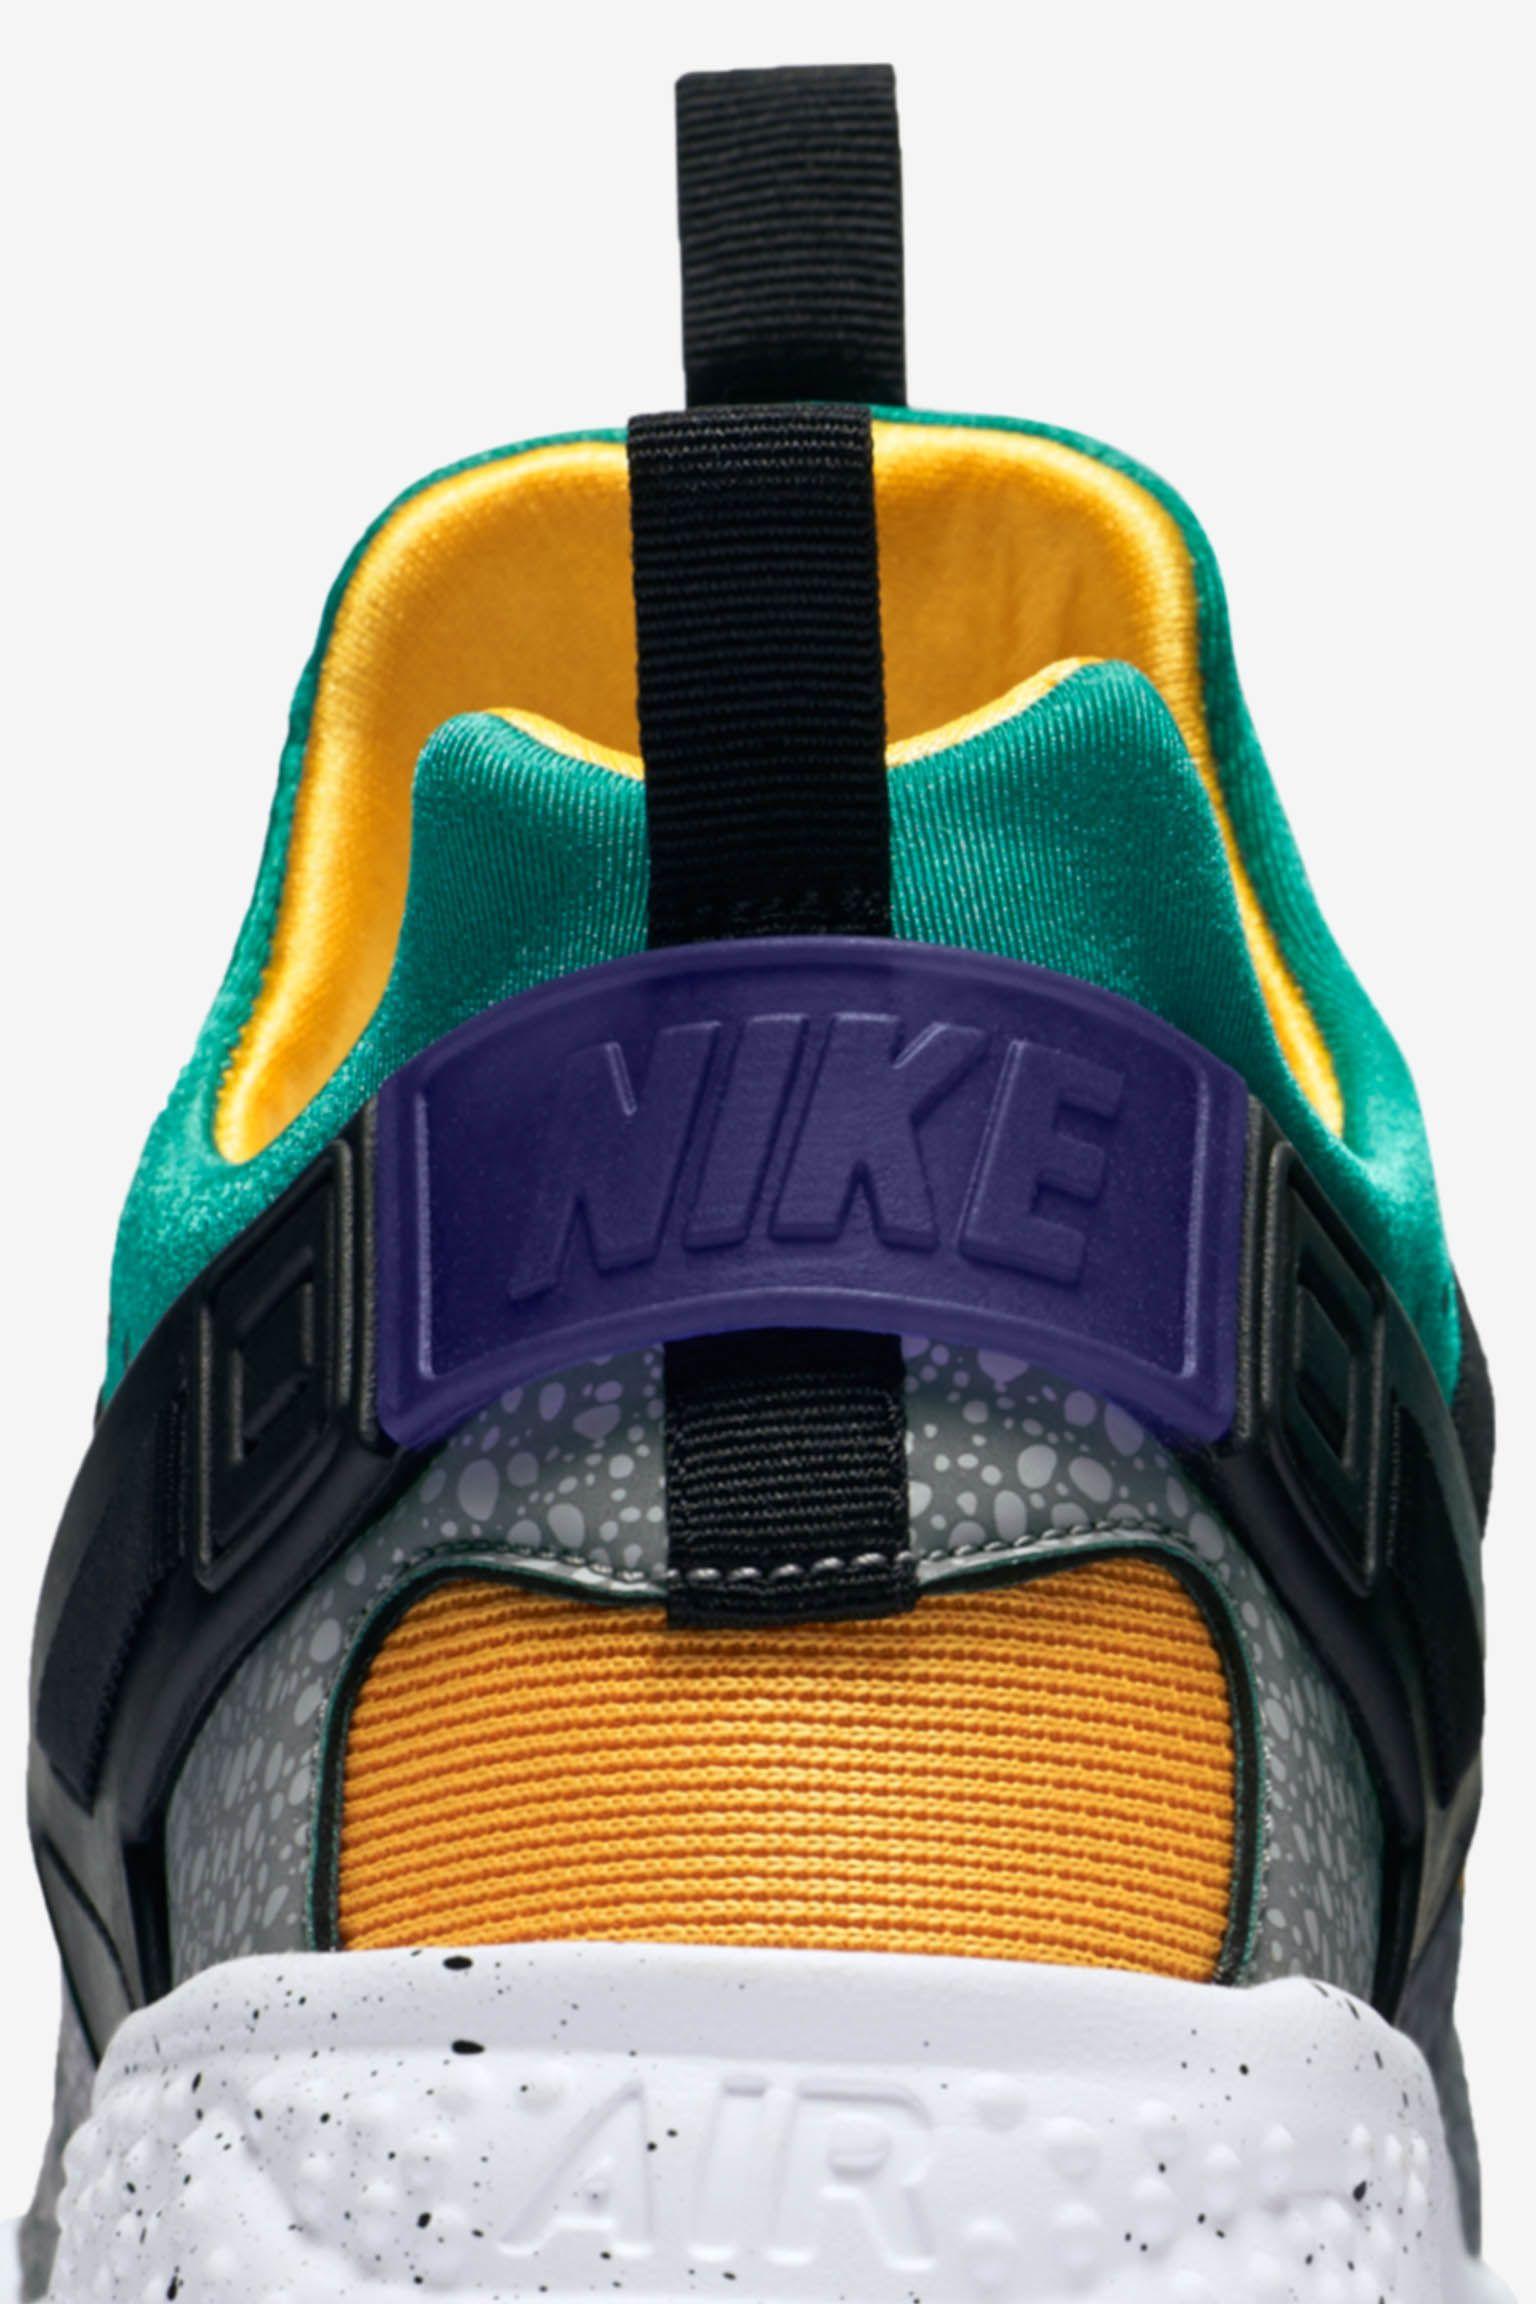 Nike Air Huarache Utility 'Safari & Emerald Green'